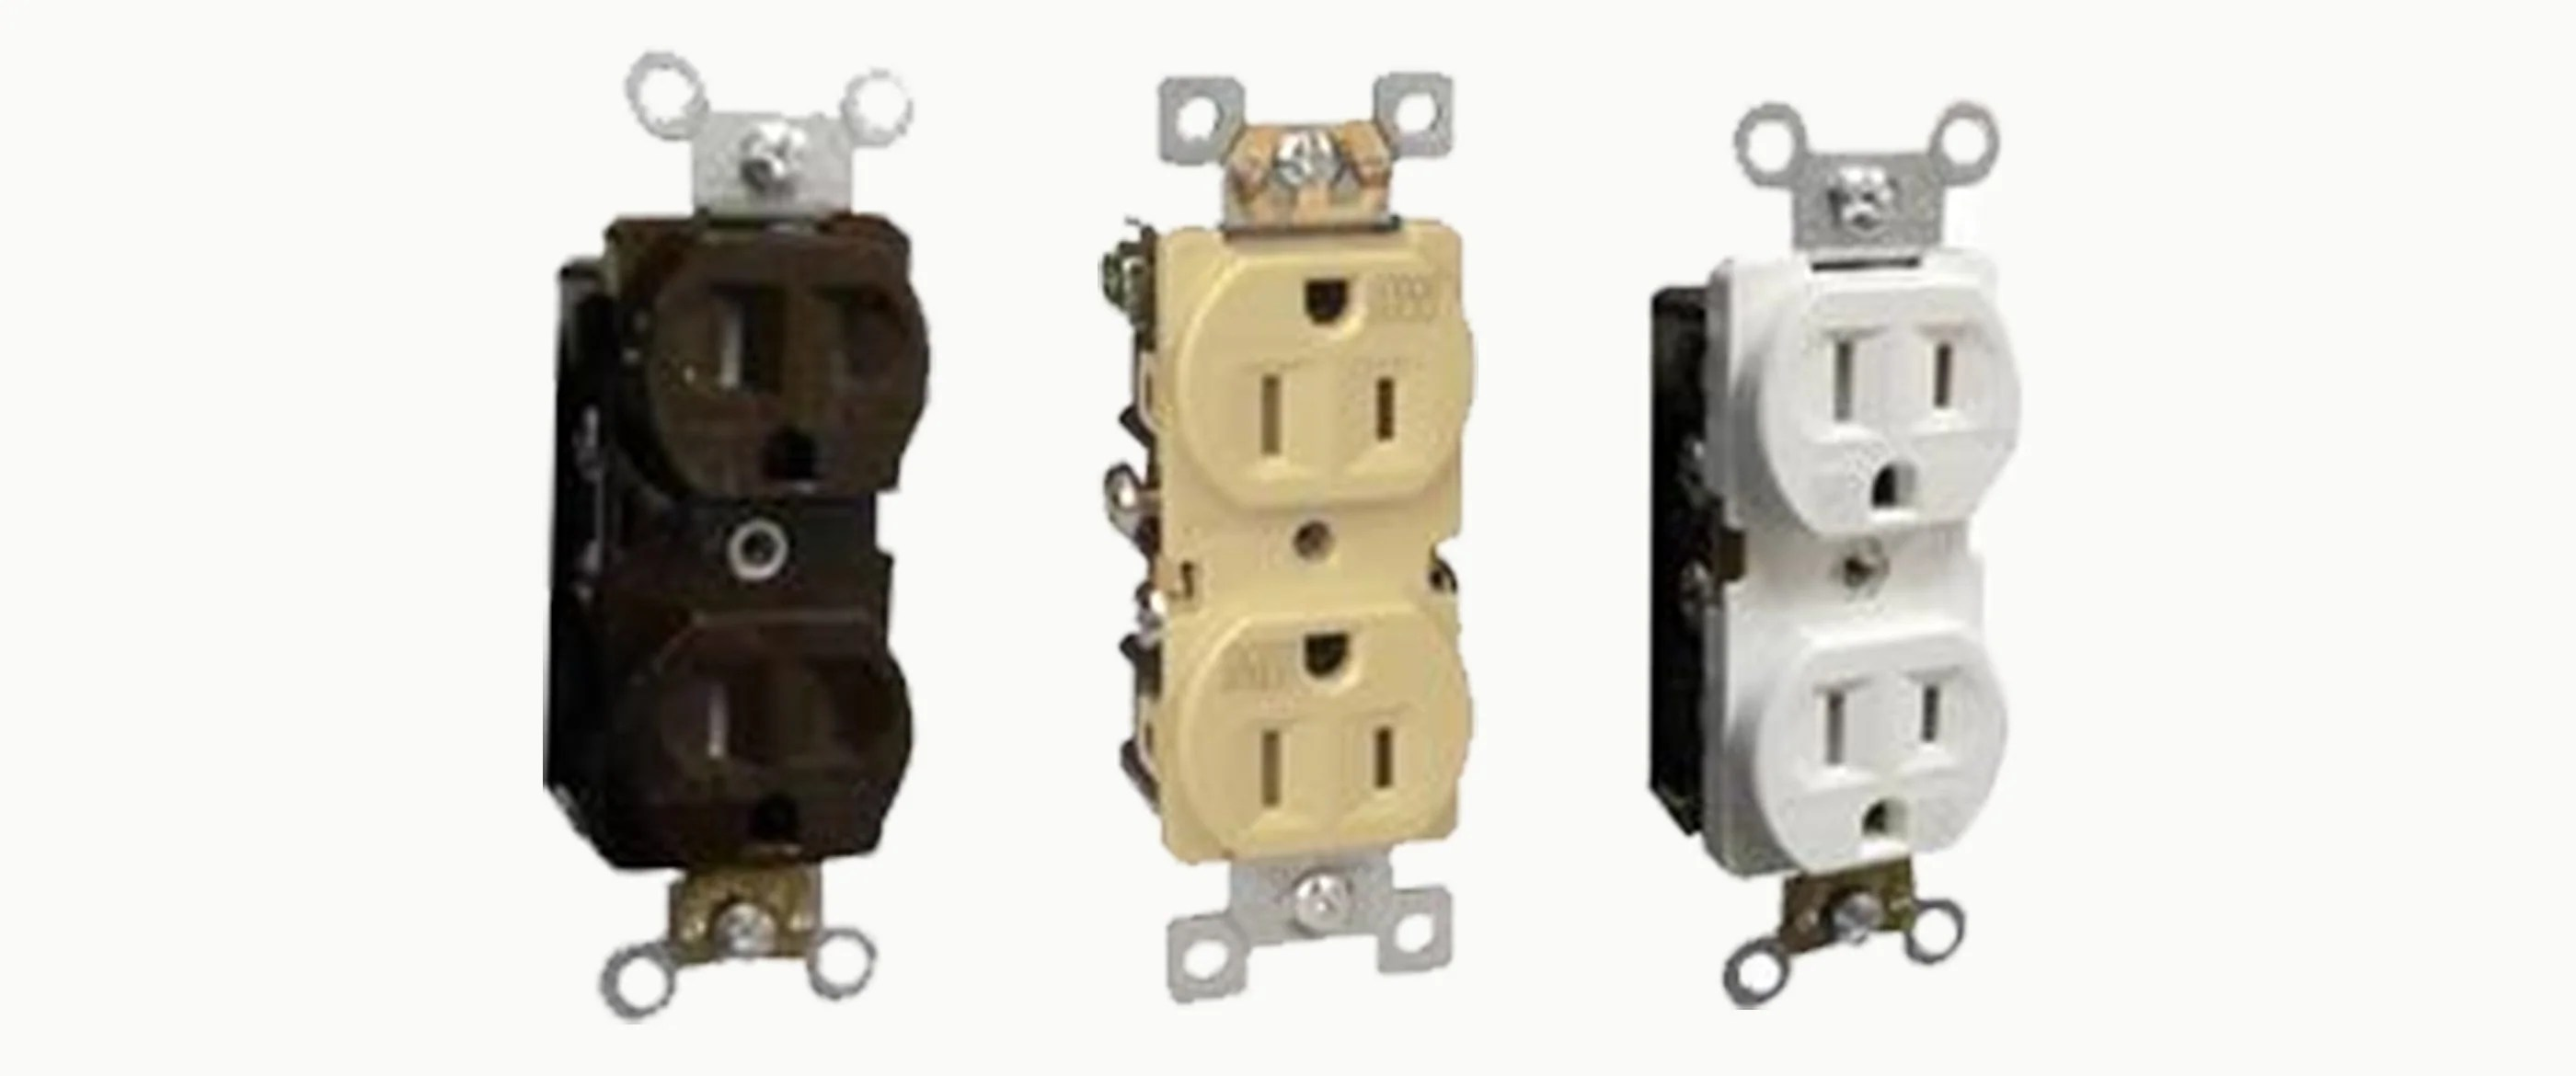 medium resolution of  duplex wiring diagram for duplex receptacle on duplex switch receptacle ungrounded duplex with usb